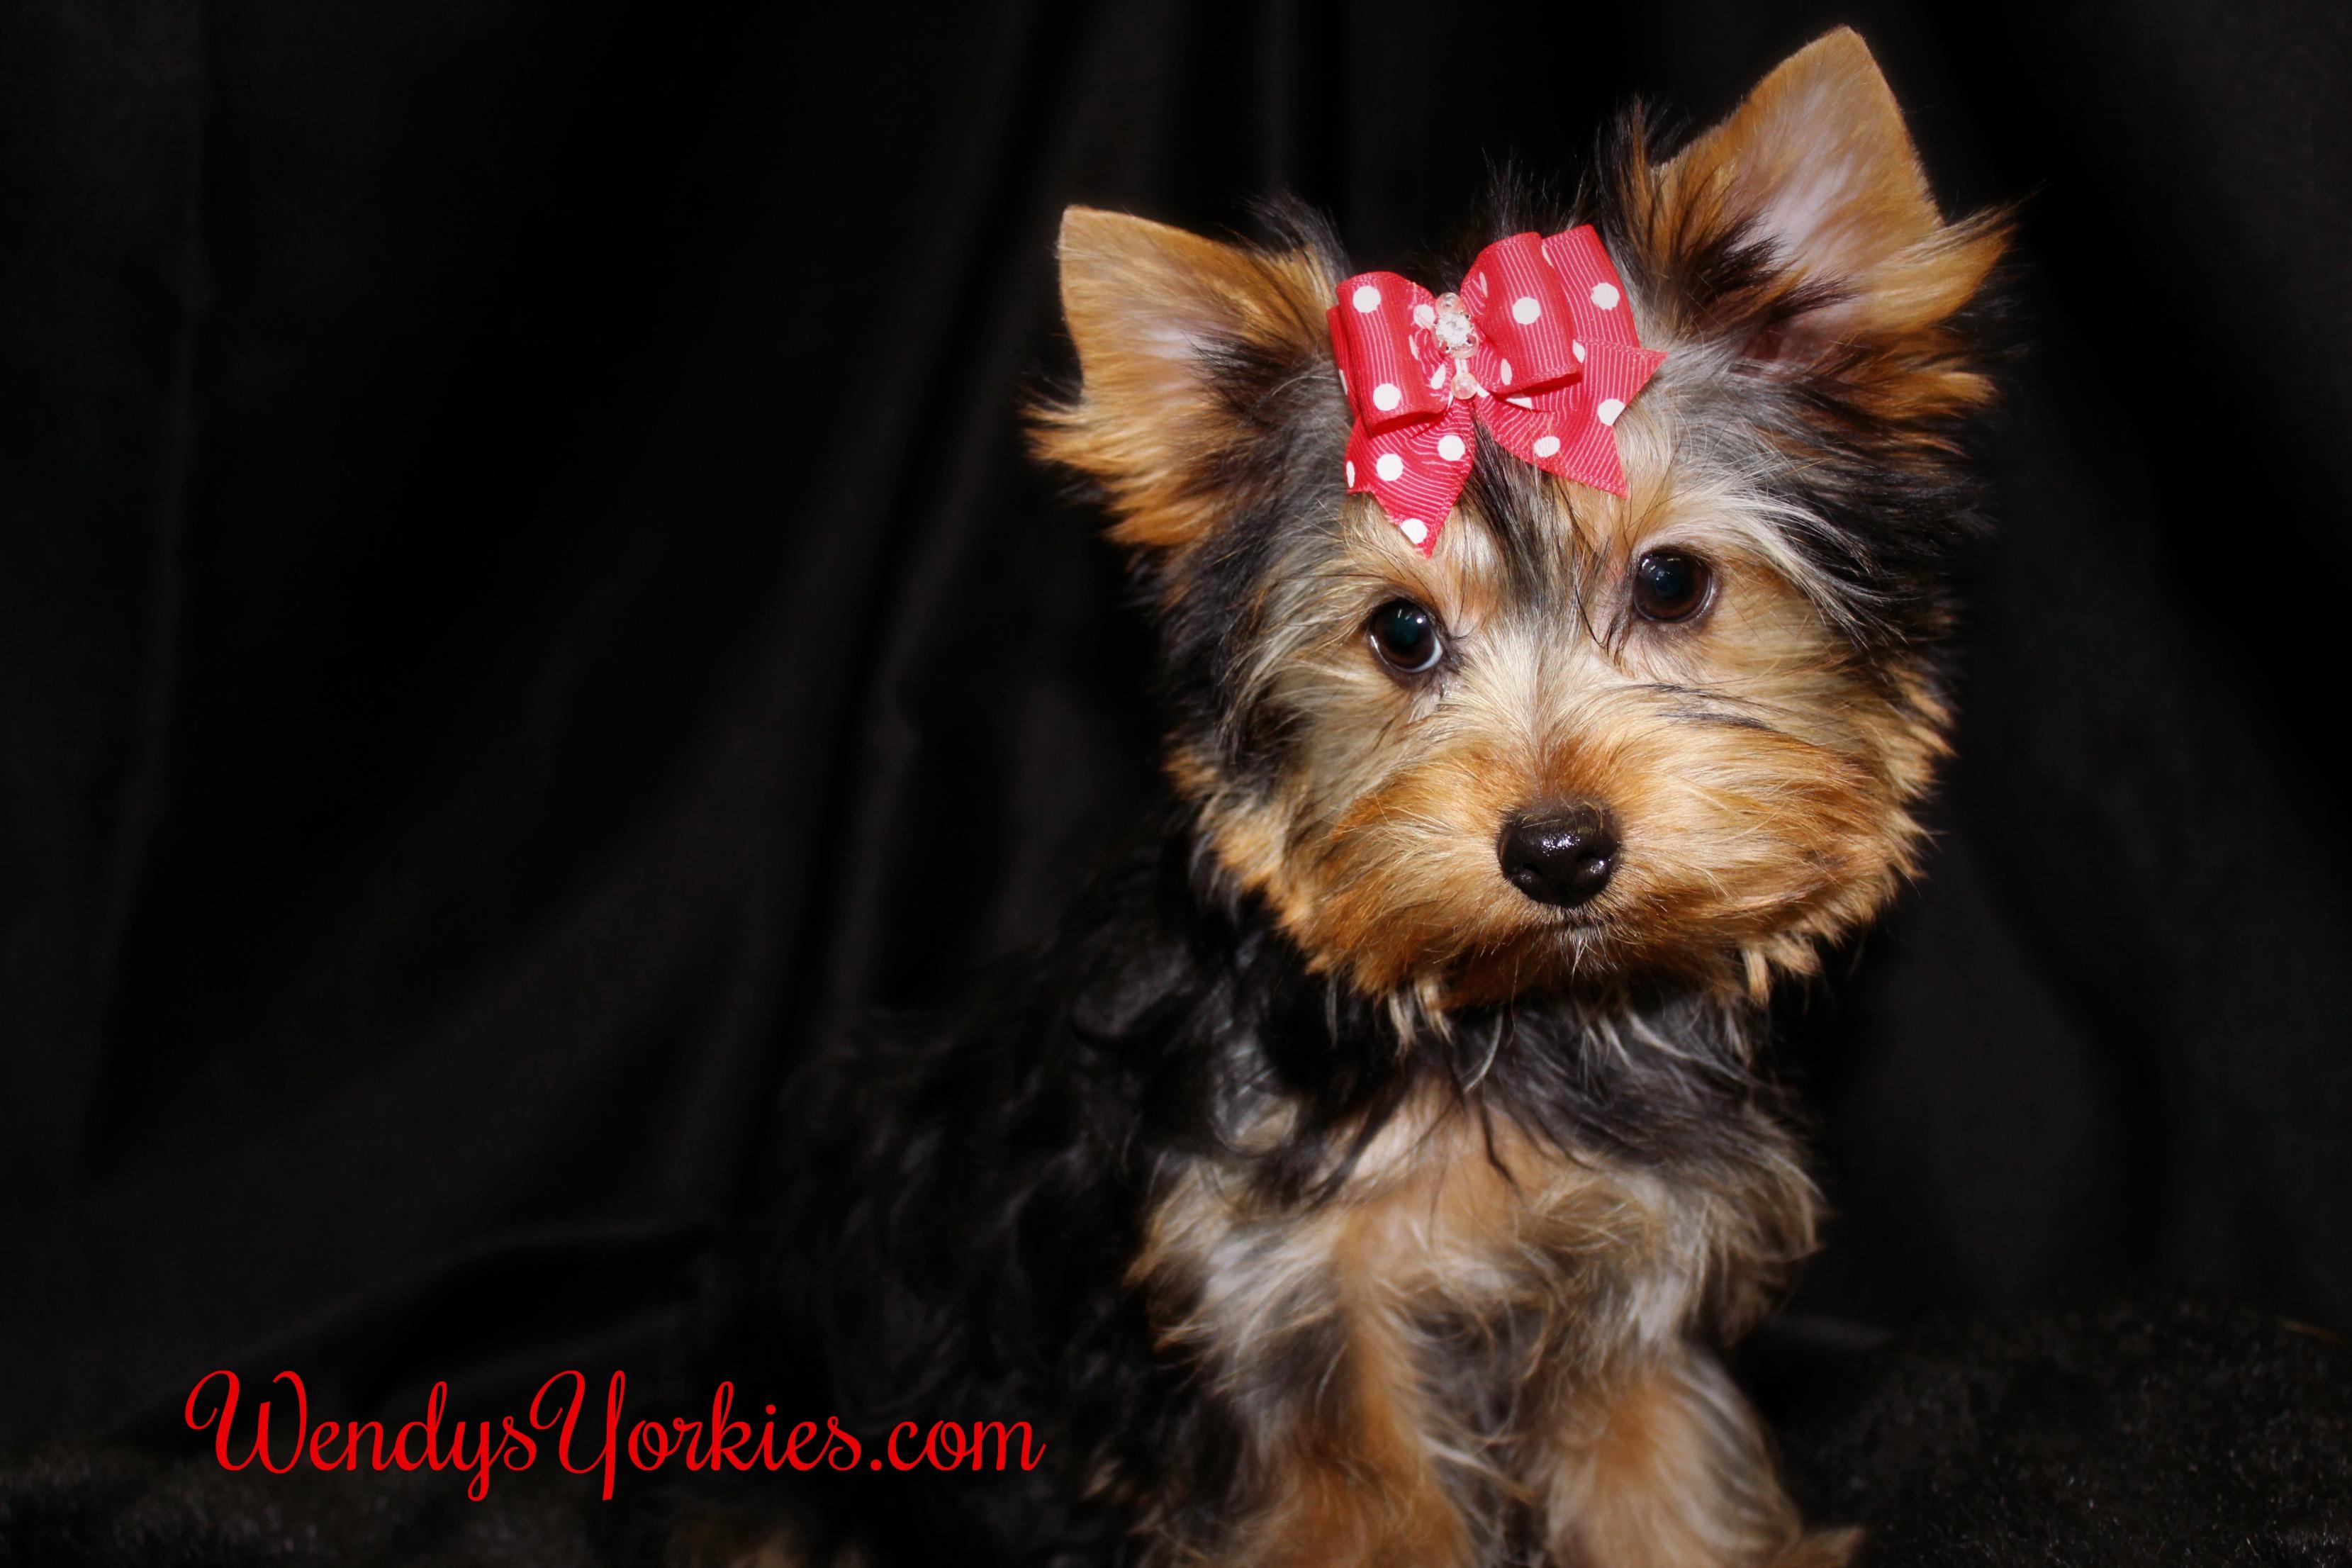 Teacup Yorkie puppies for sale, WendysYorkies.com, Holly